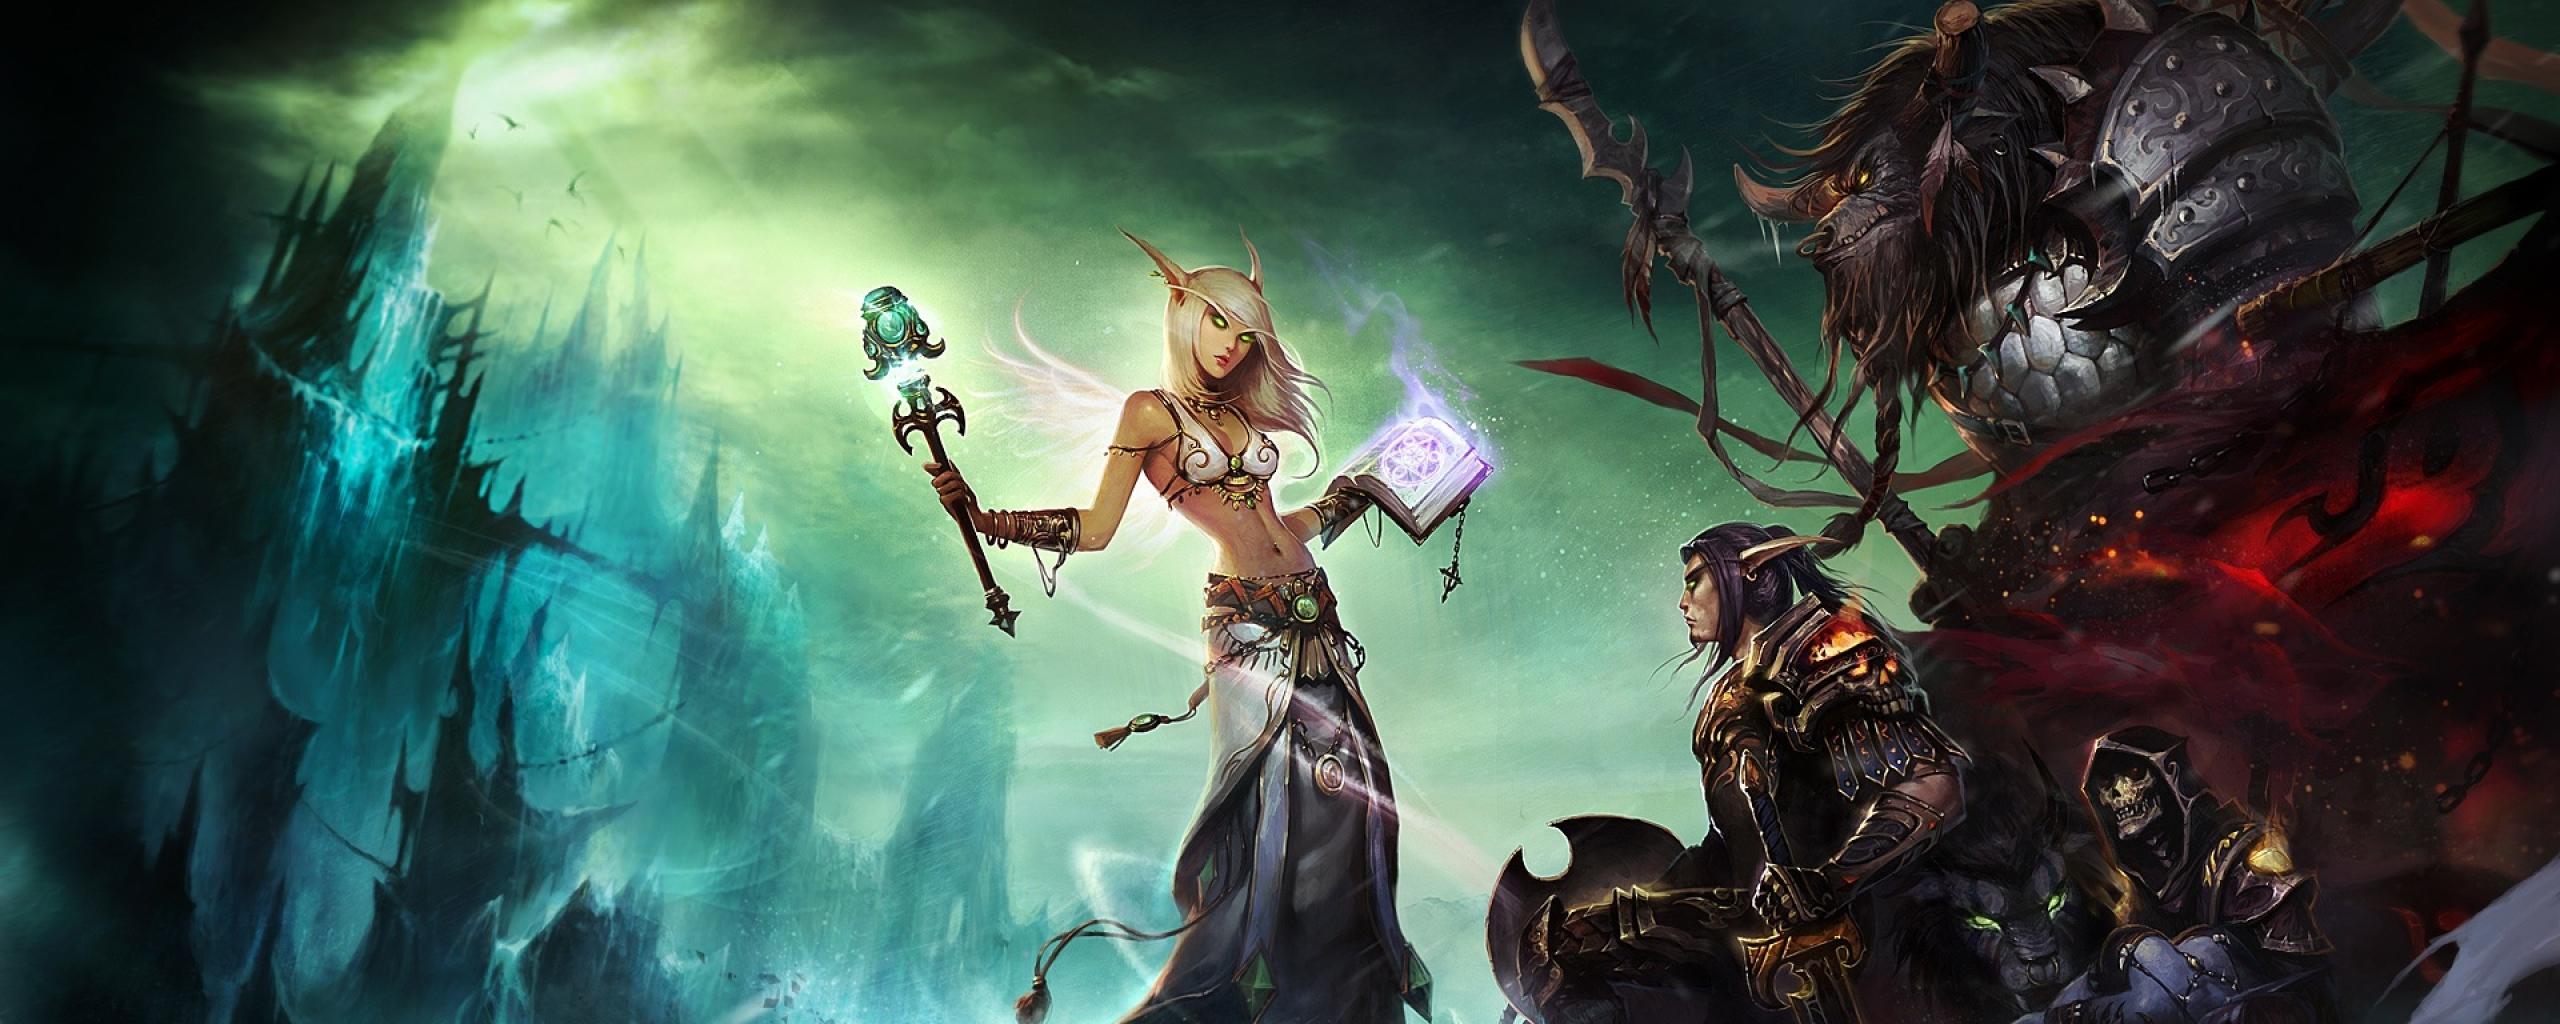 Download Wallpaper 2560x1024 World of warcraft, Female, Sky